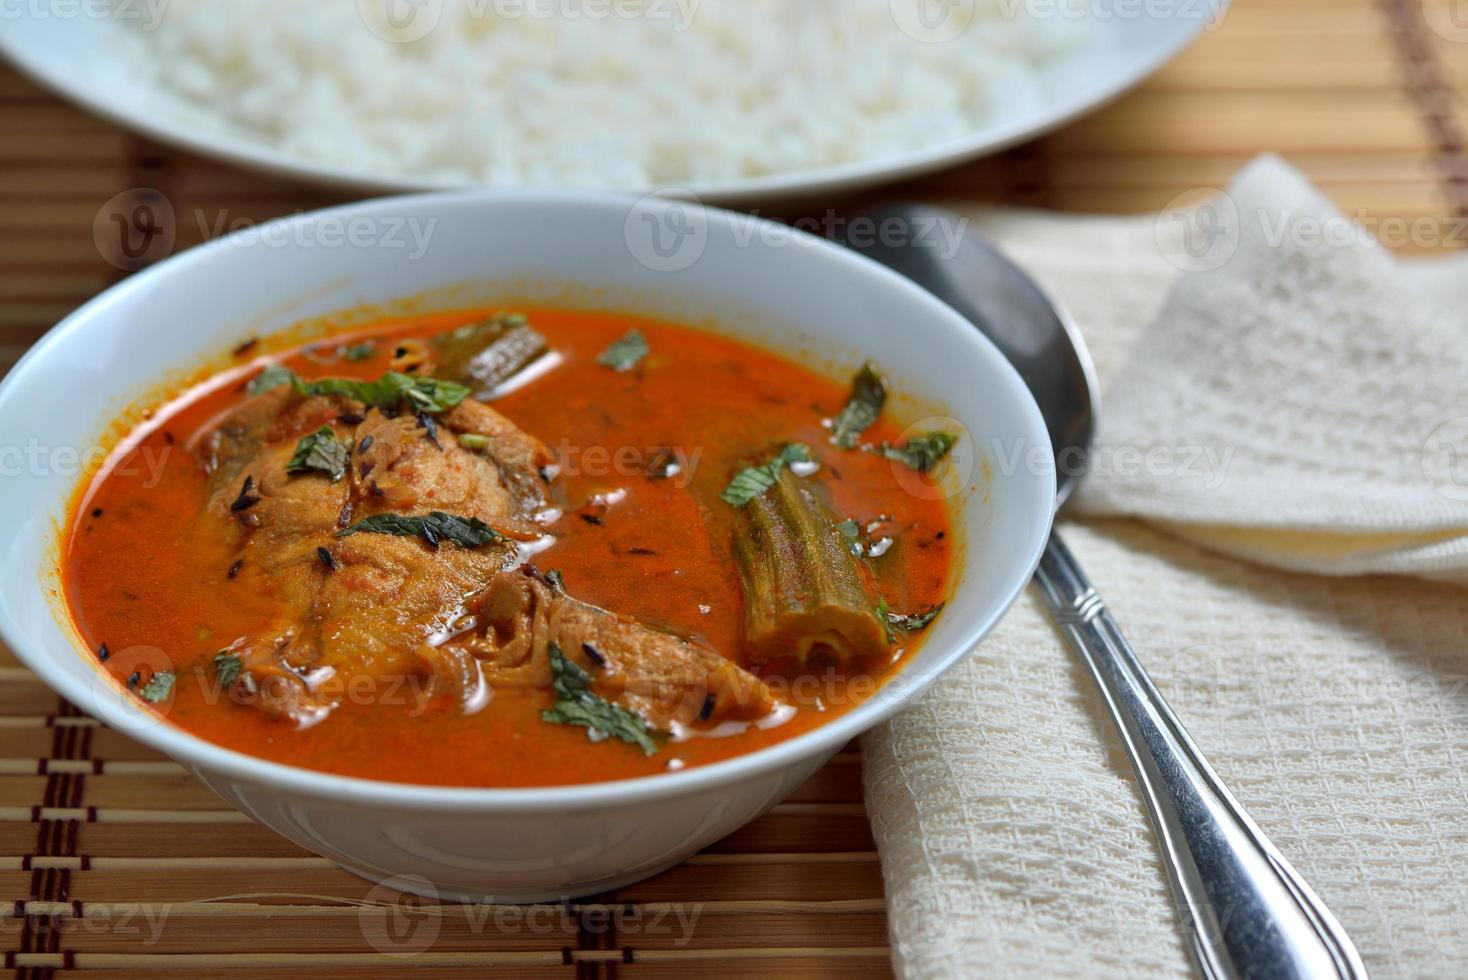 tamilnadu trevally gracejo de peixe com arroz branco foto